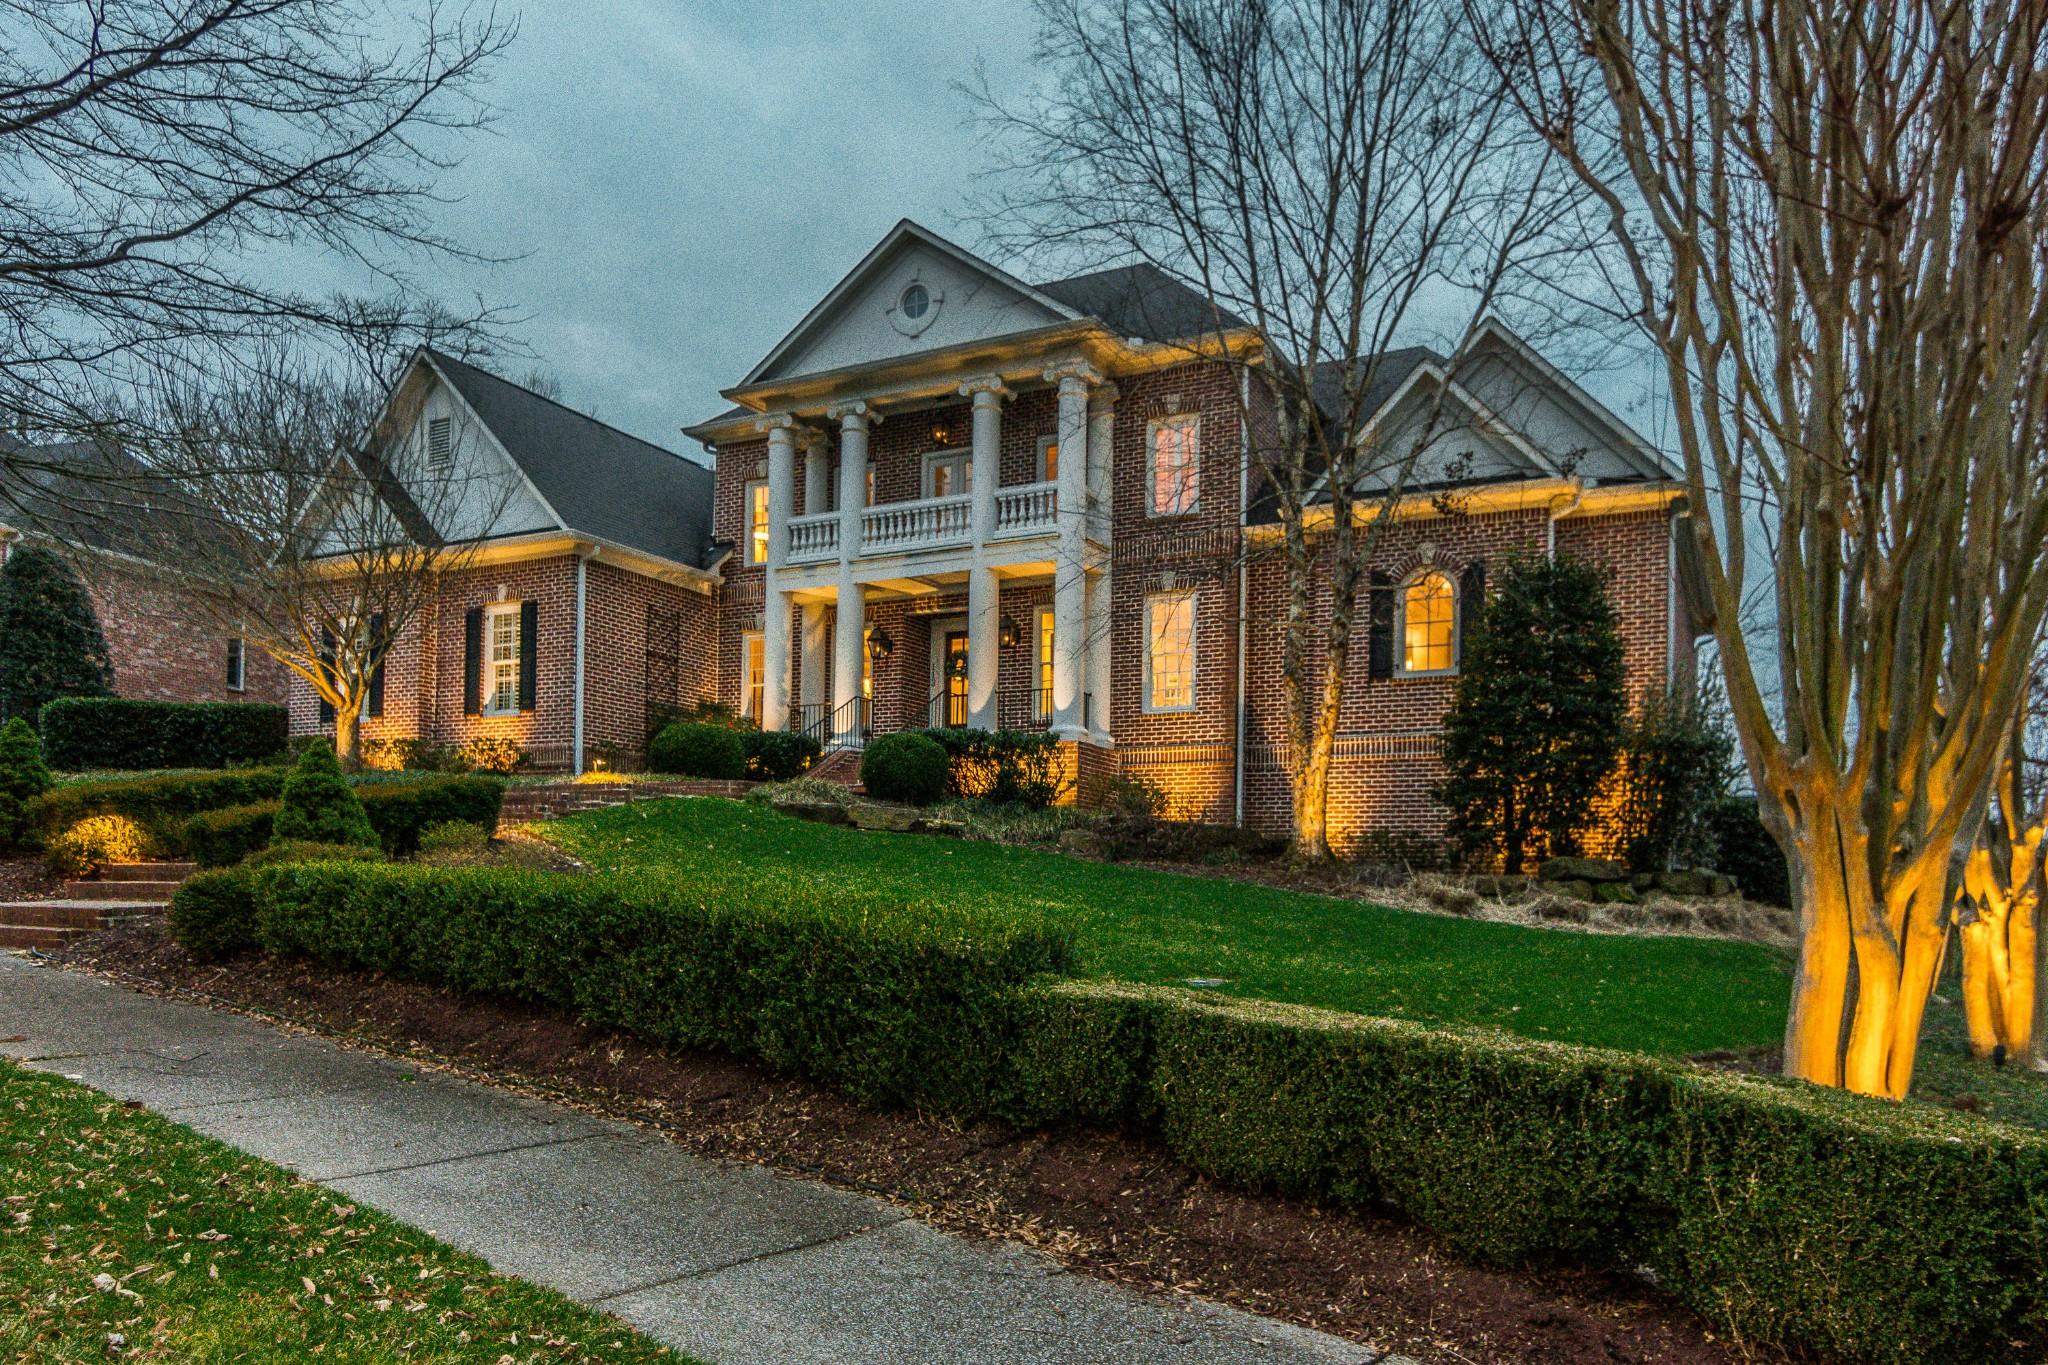 113 Chatfield Way, Franklin, TN 37067 - Franklin, TN real estate listing